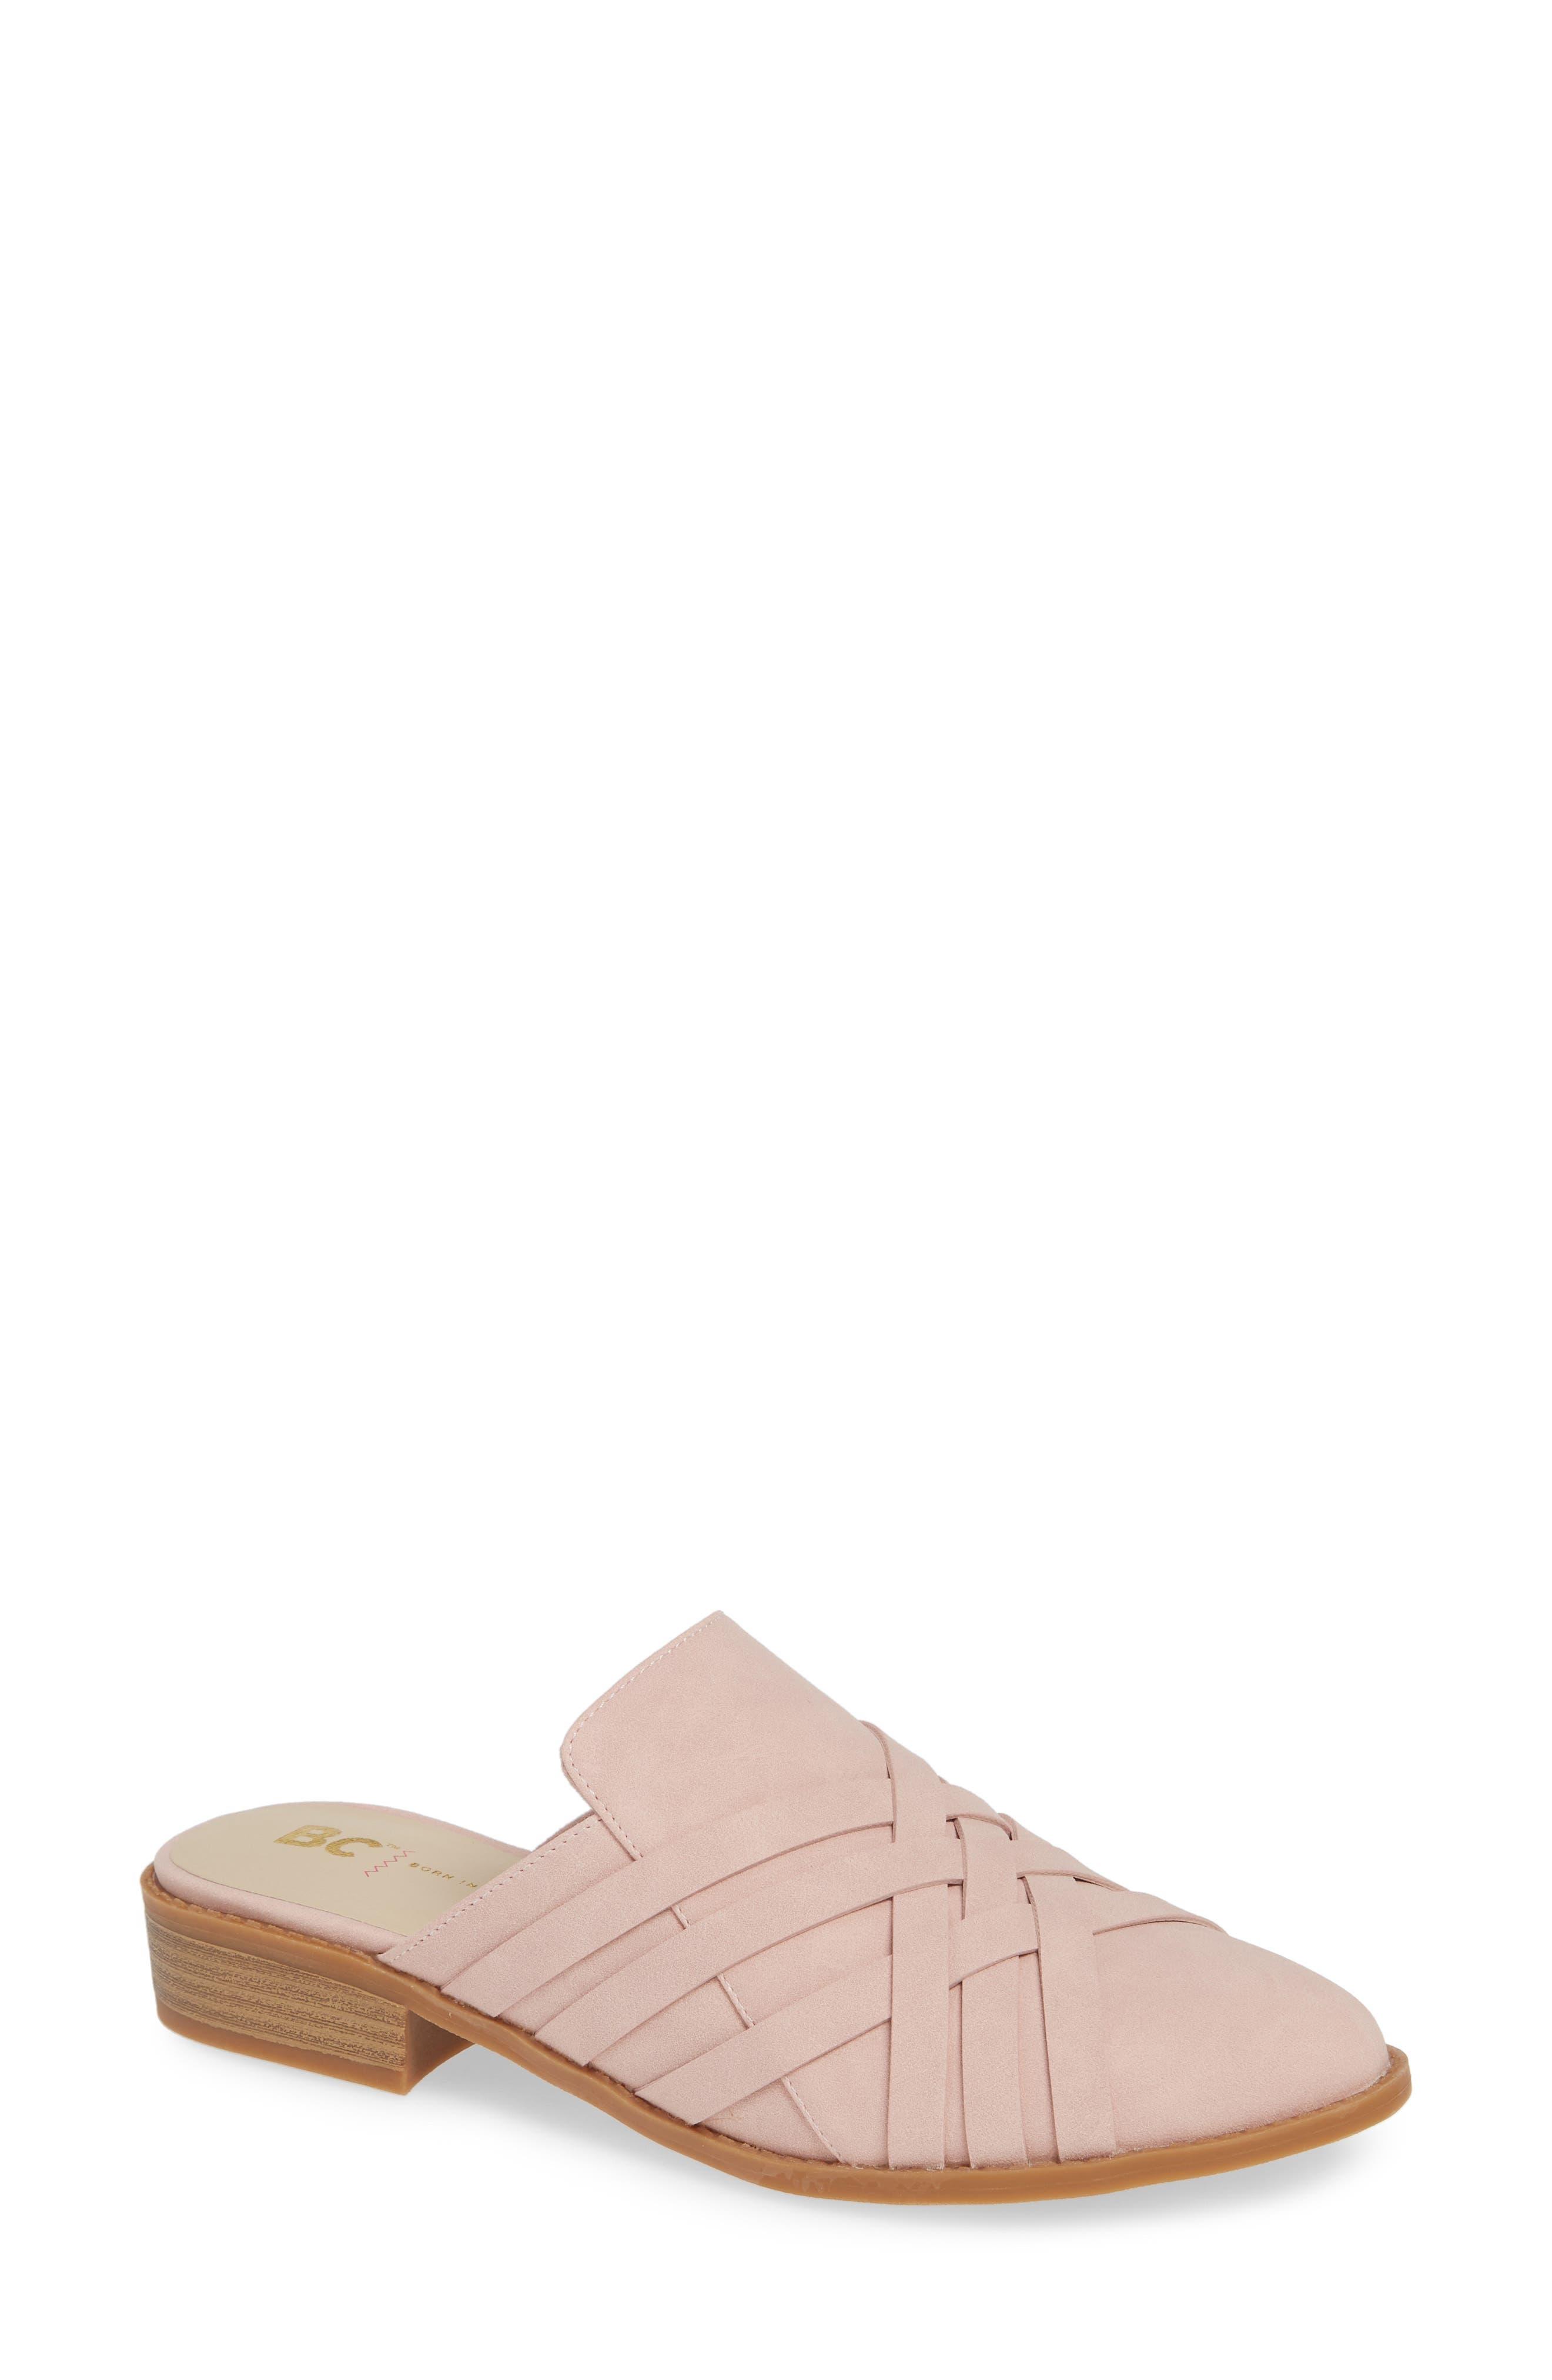 Bc Footwear Reflection Pool Vegan Mule, Pink